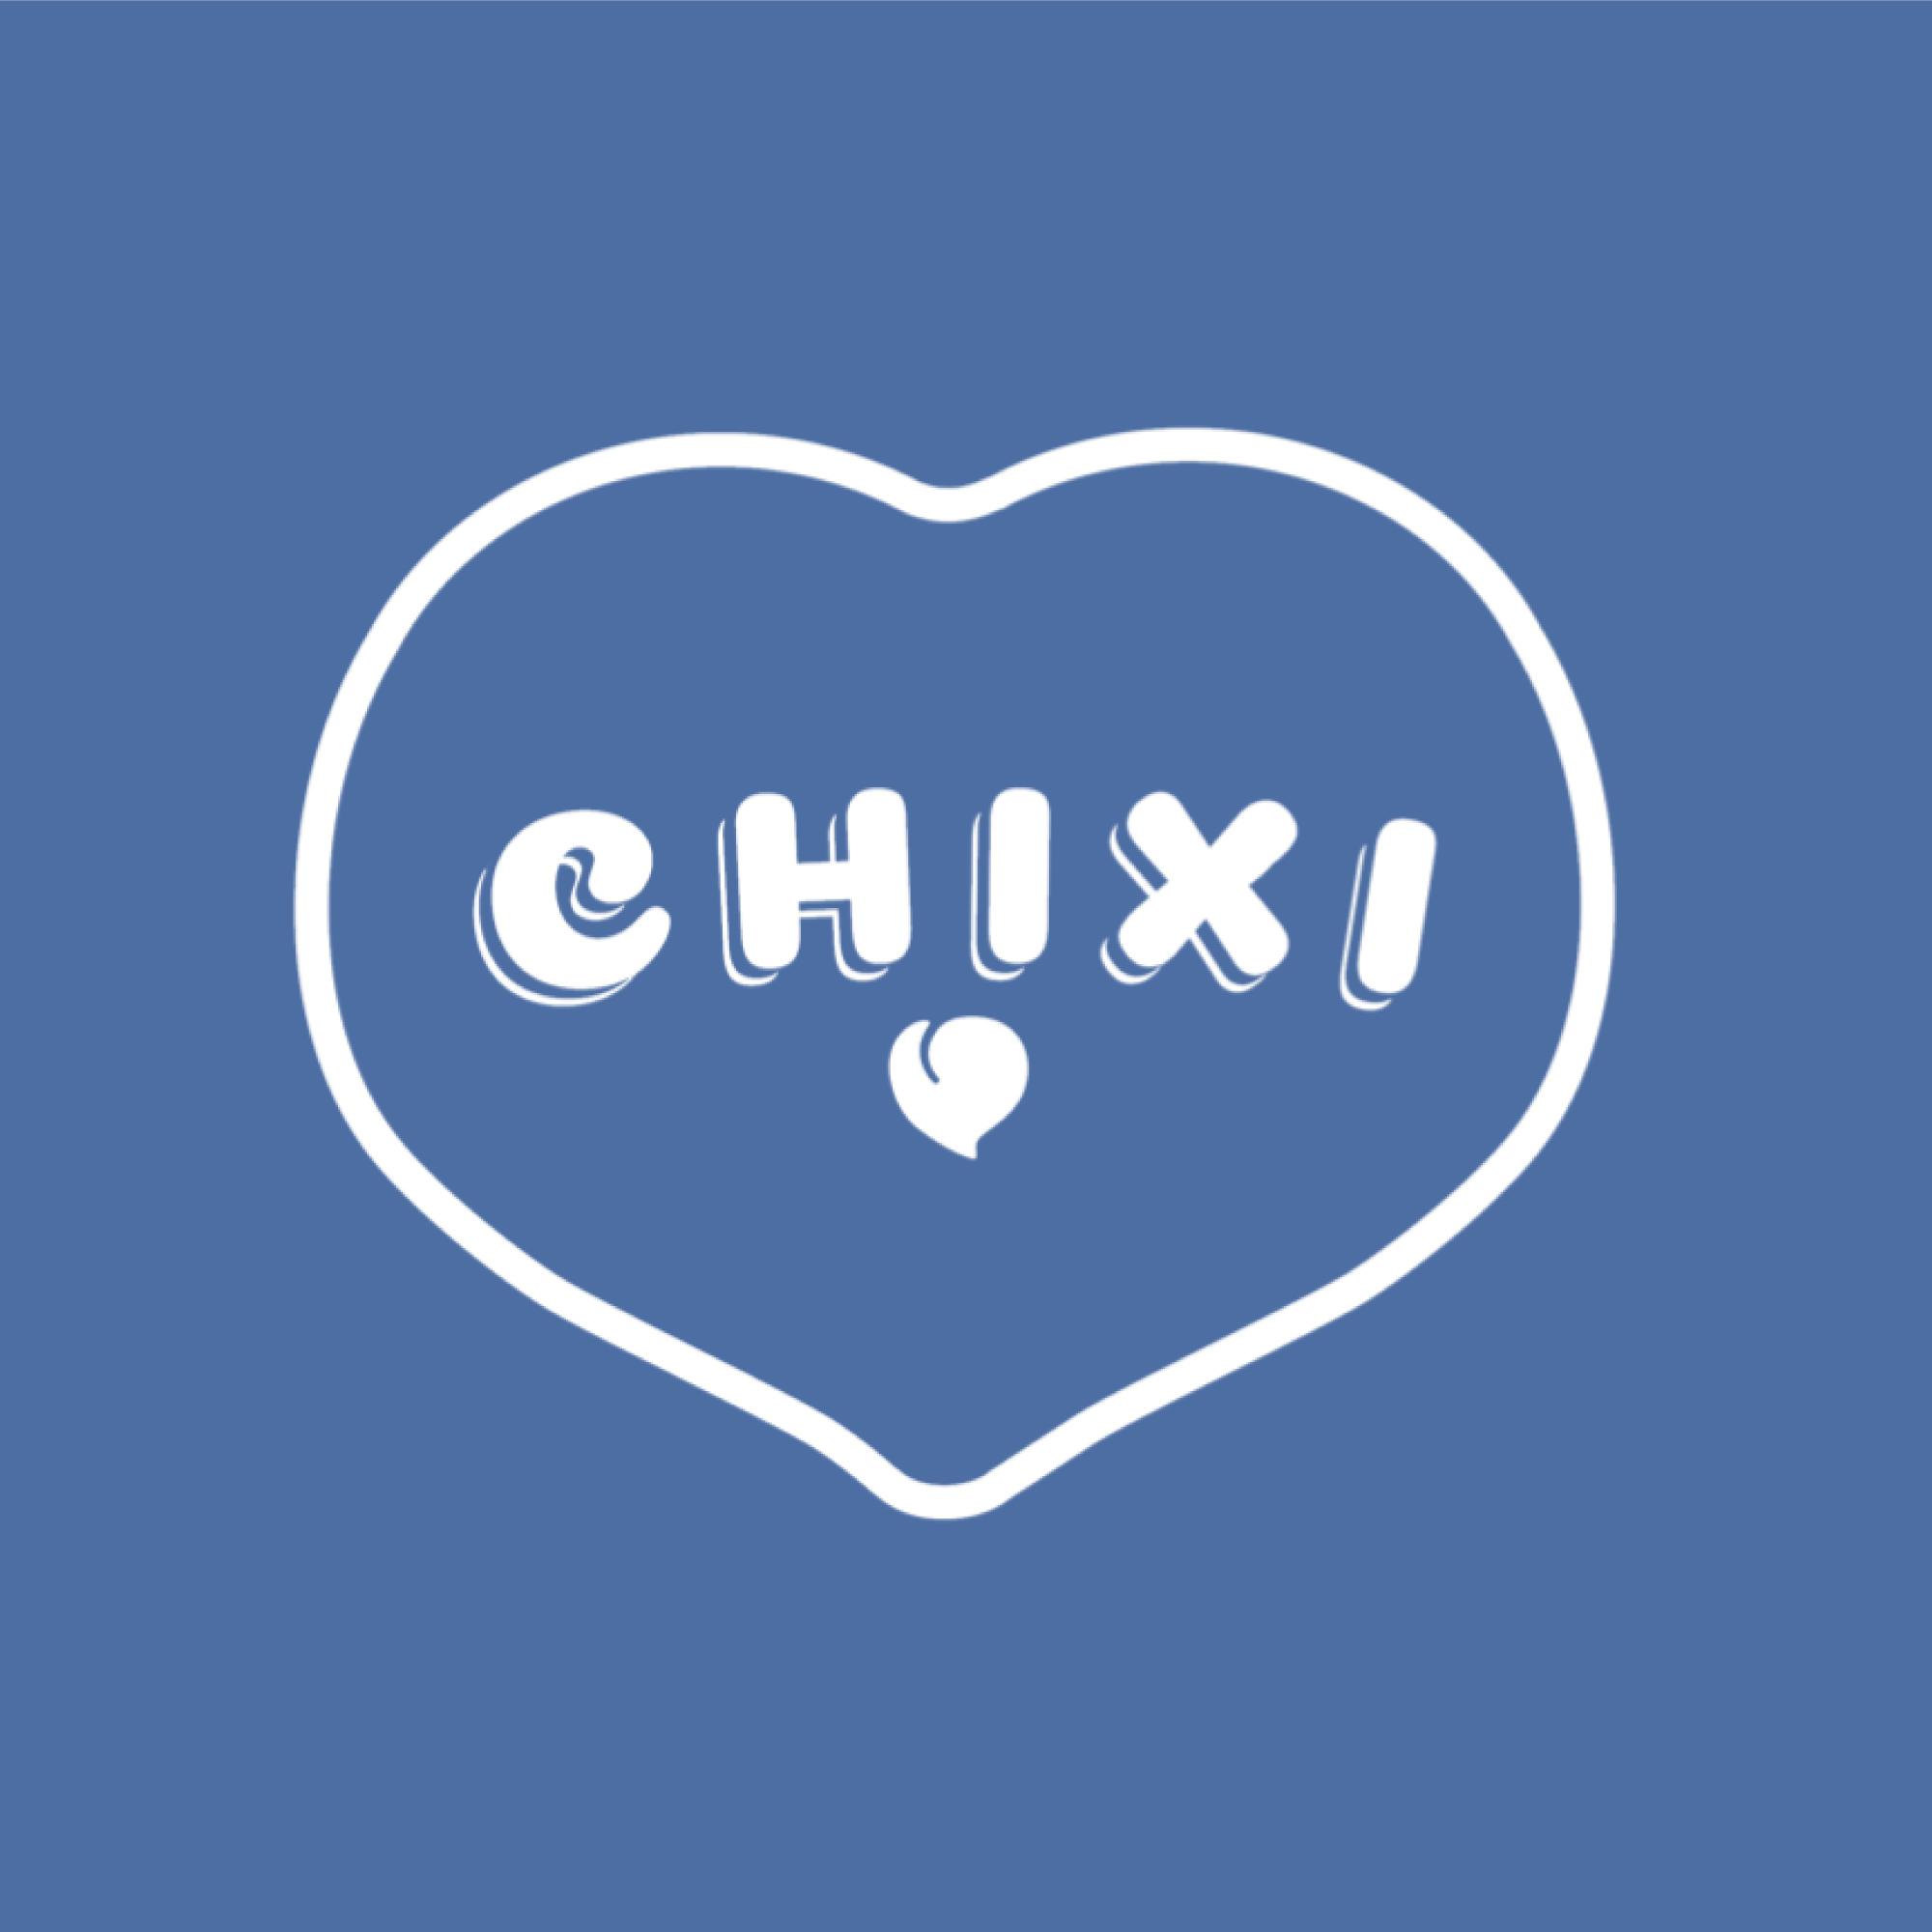 ChixiSocialIcon.jpg